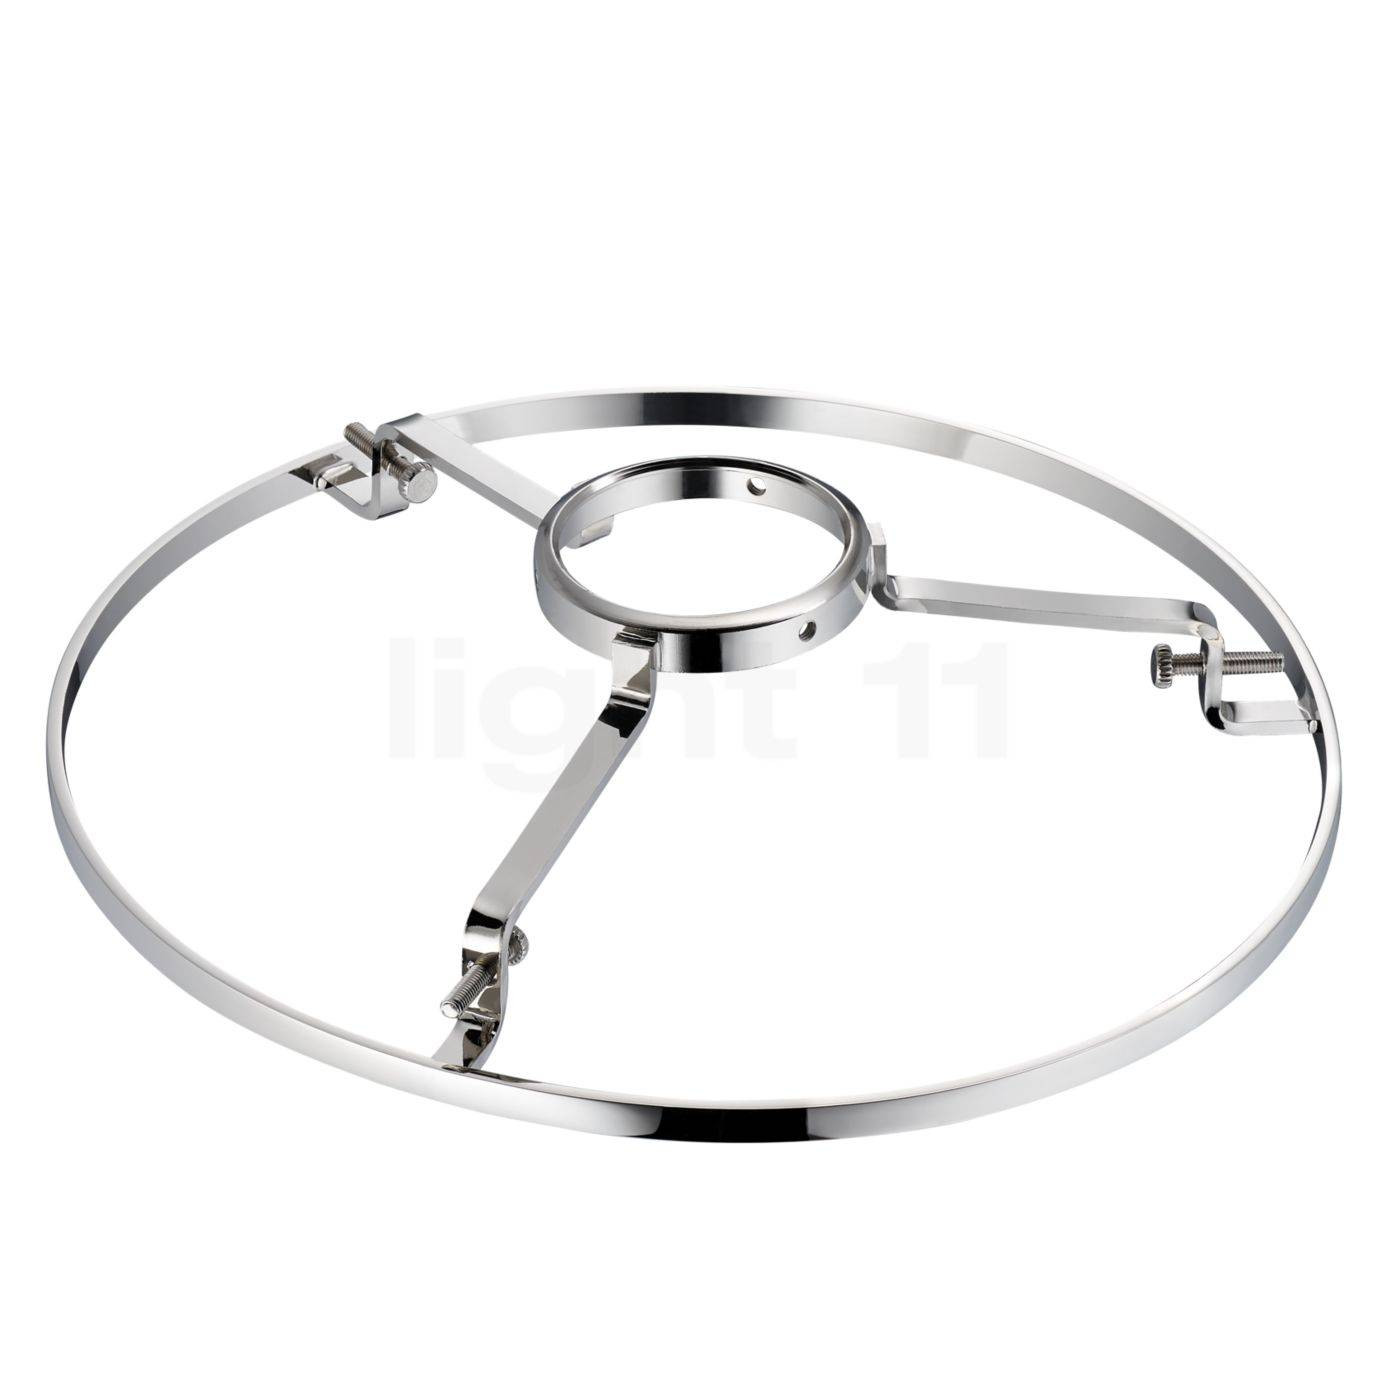 Tecnolumen Anneau de support de verre pour Wagenfeld, Pièce de rechange, nickel